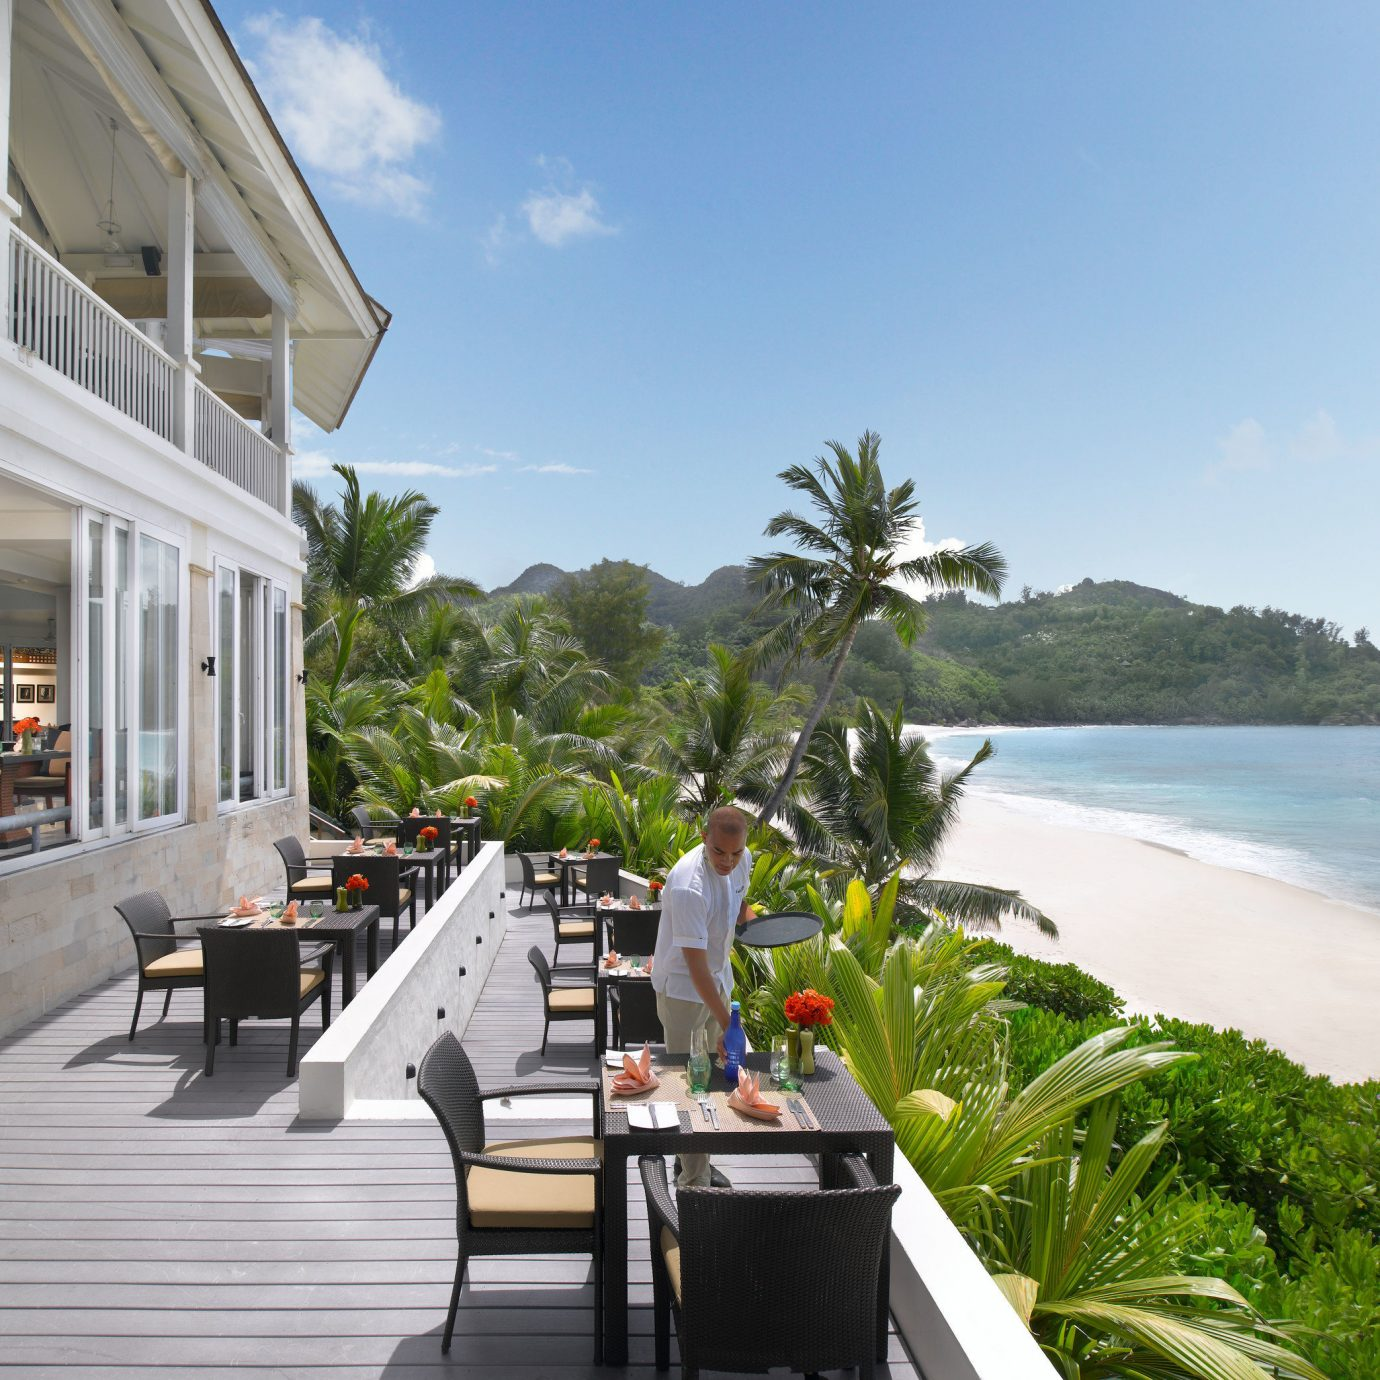 sky water building Resort walkway condominium caribbean Sea Villa porch overlooking Deck